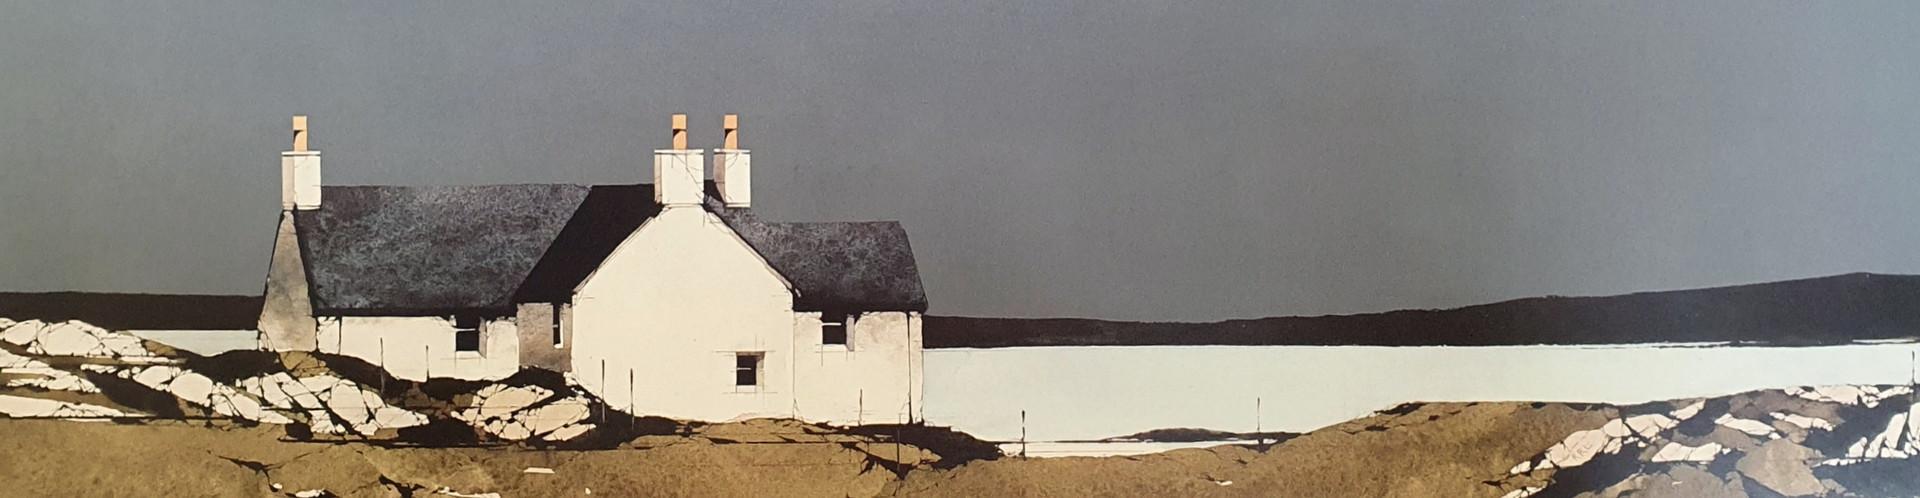 Cottage near Aird Mhor, Barra.jpg